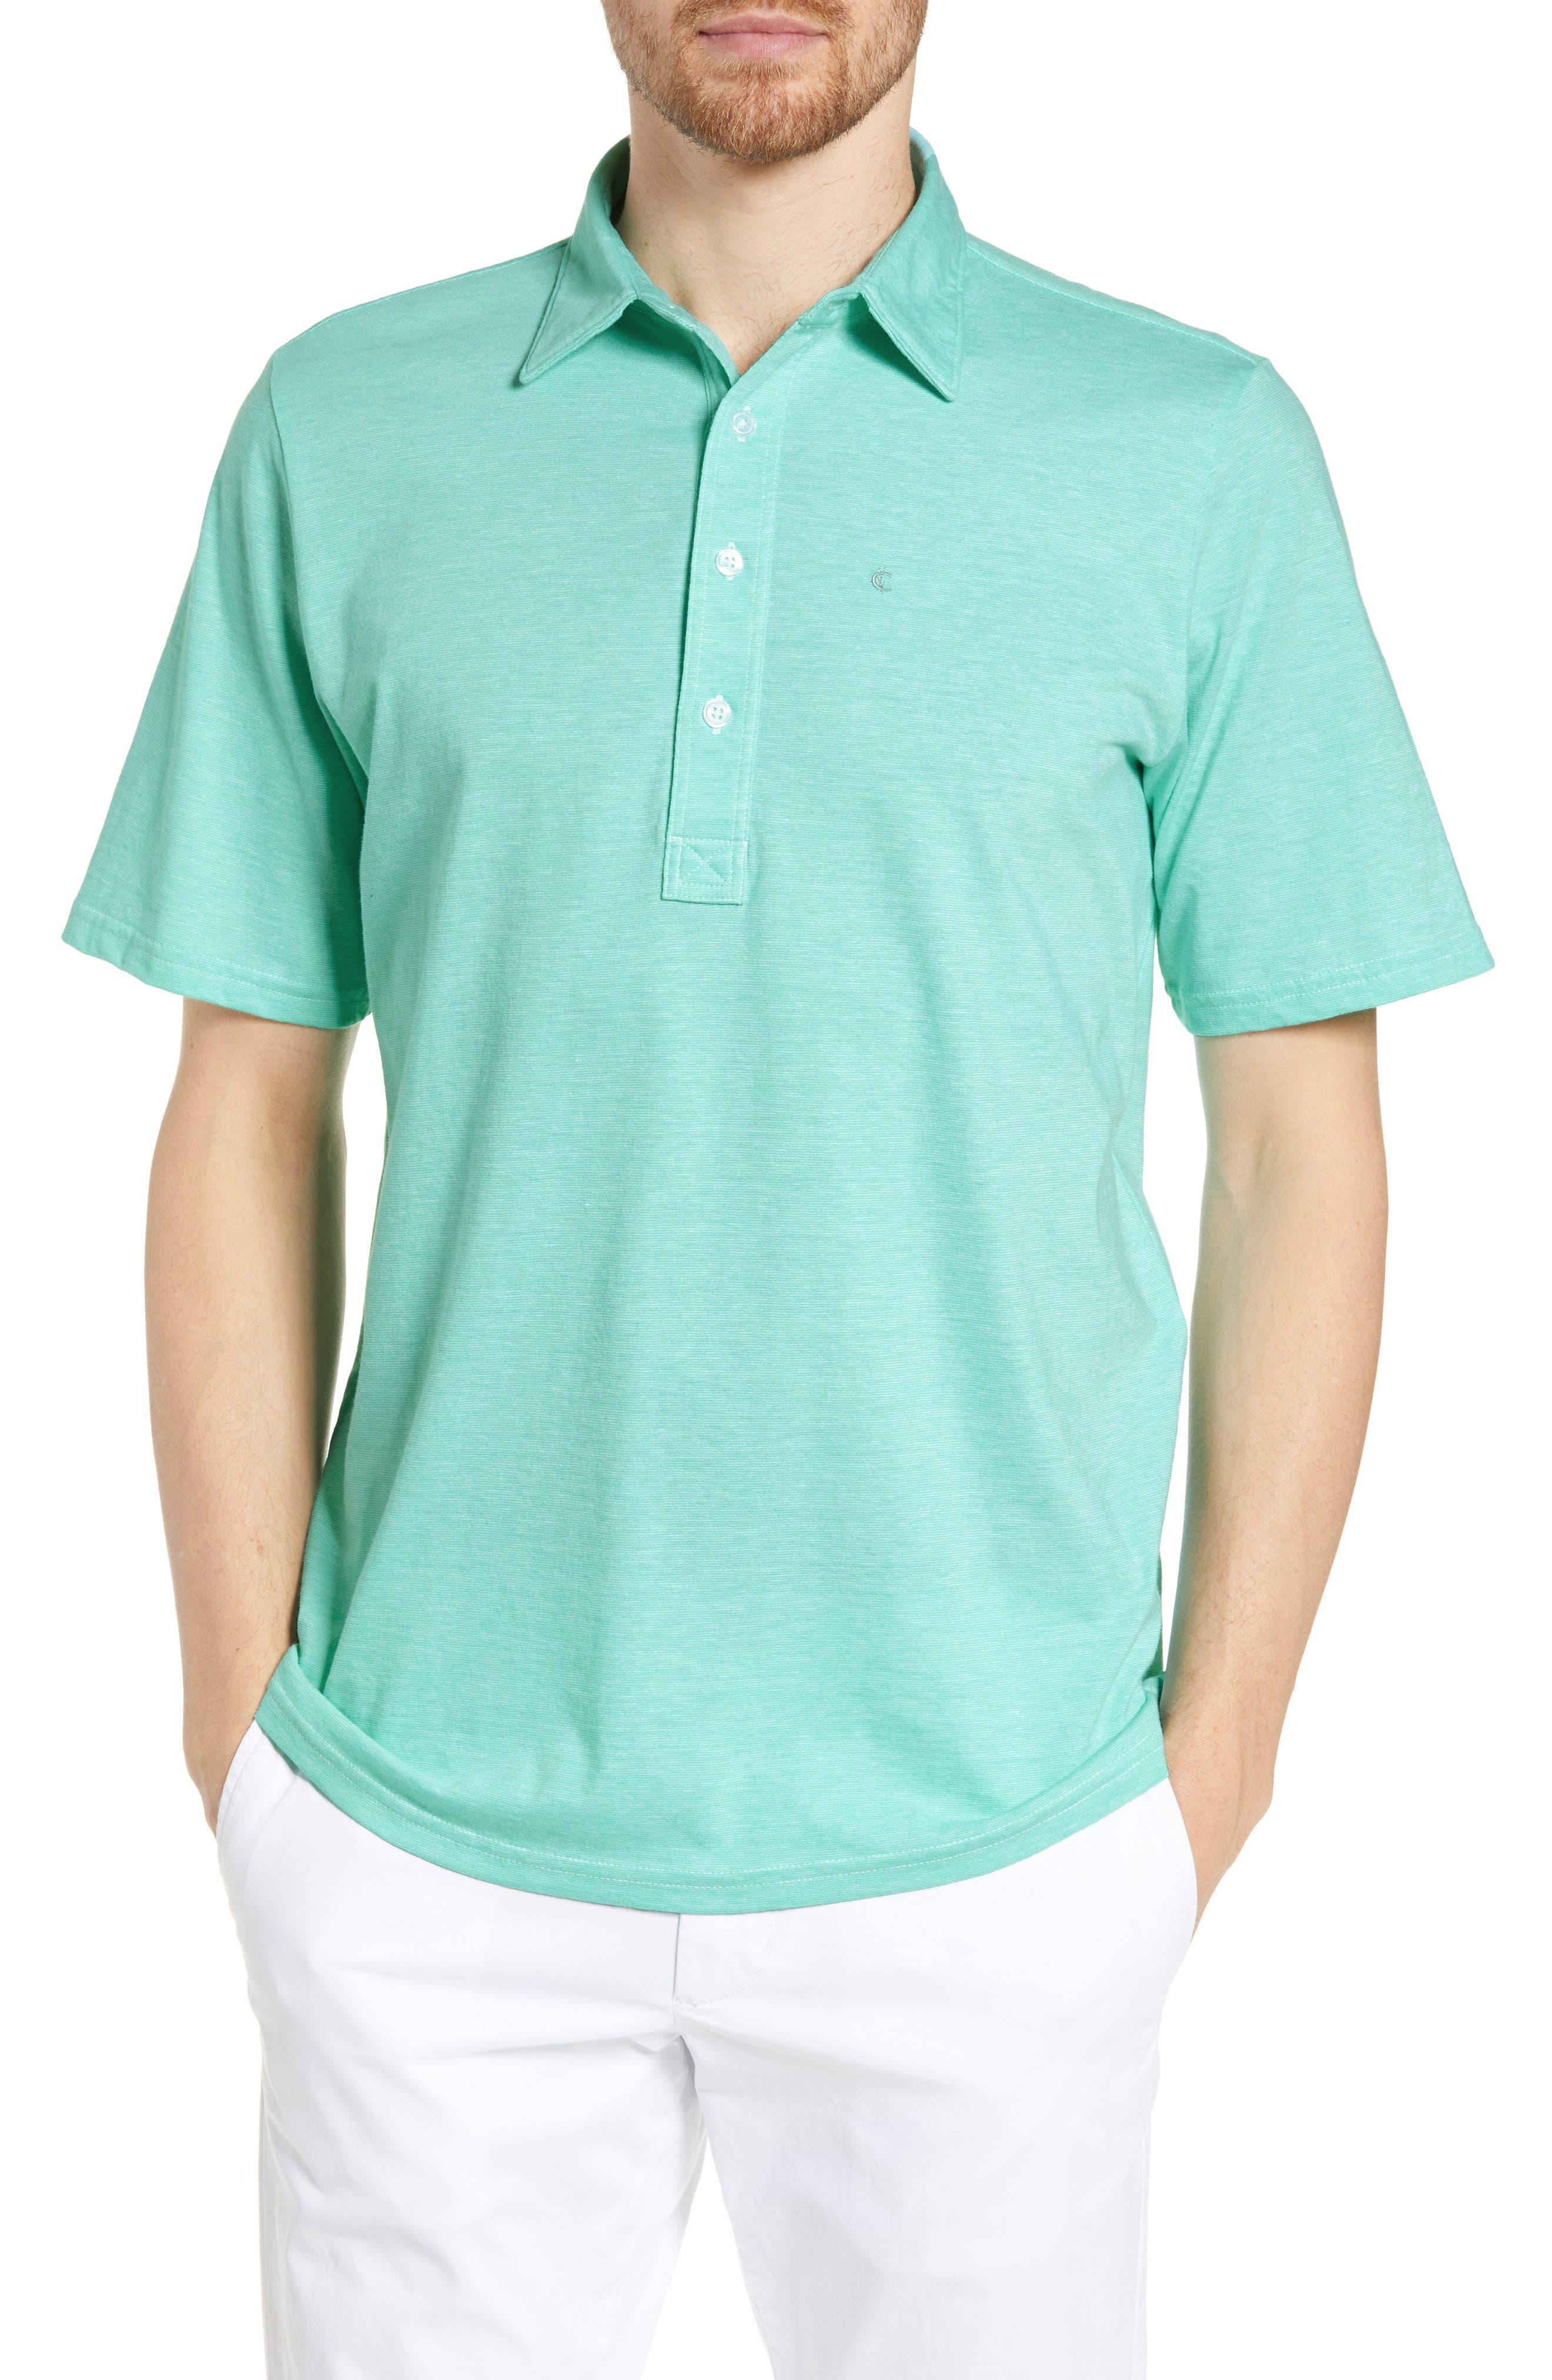 Criquet Range Regular Fit Jersey Polo, Green